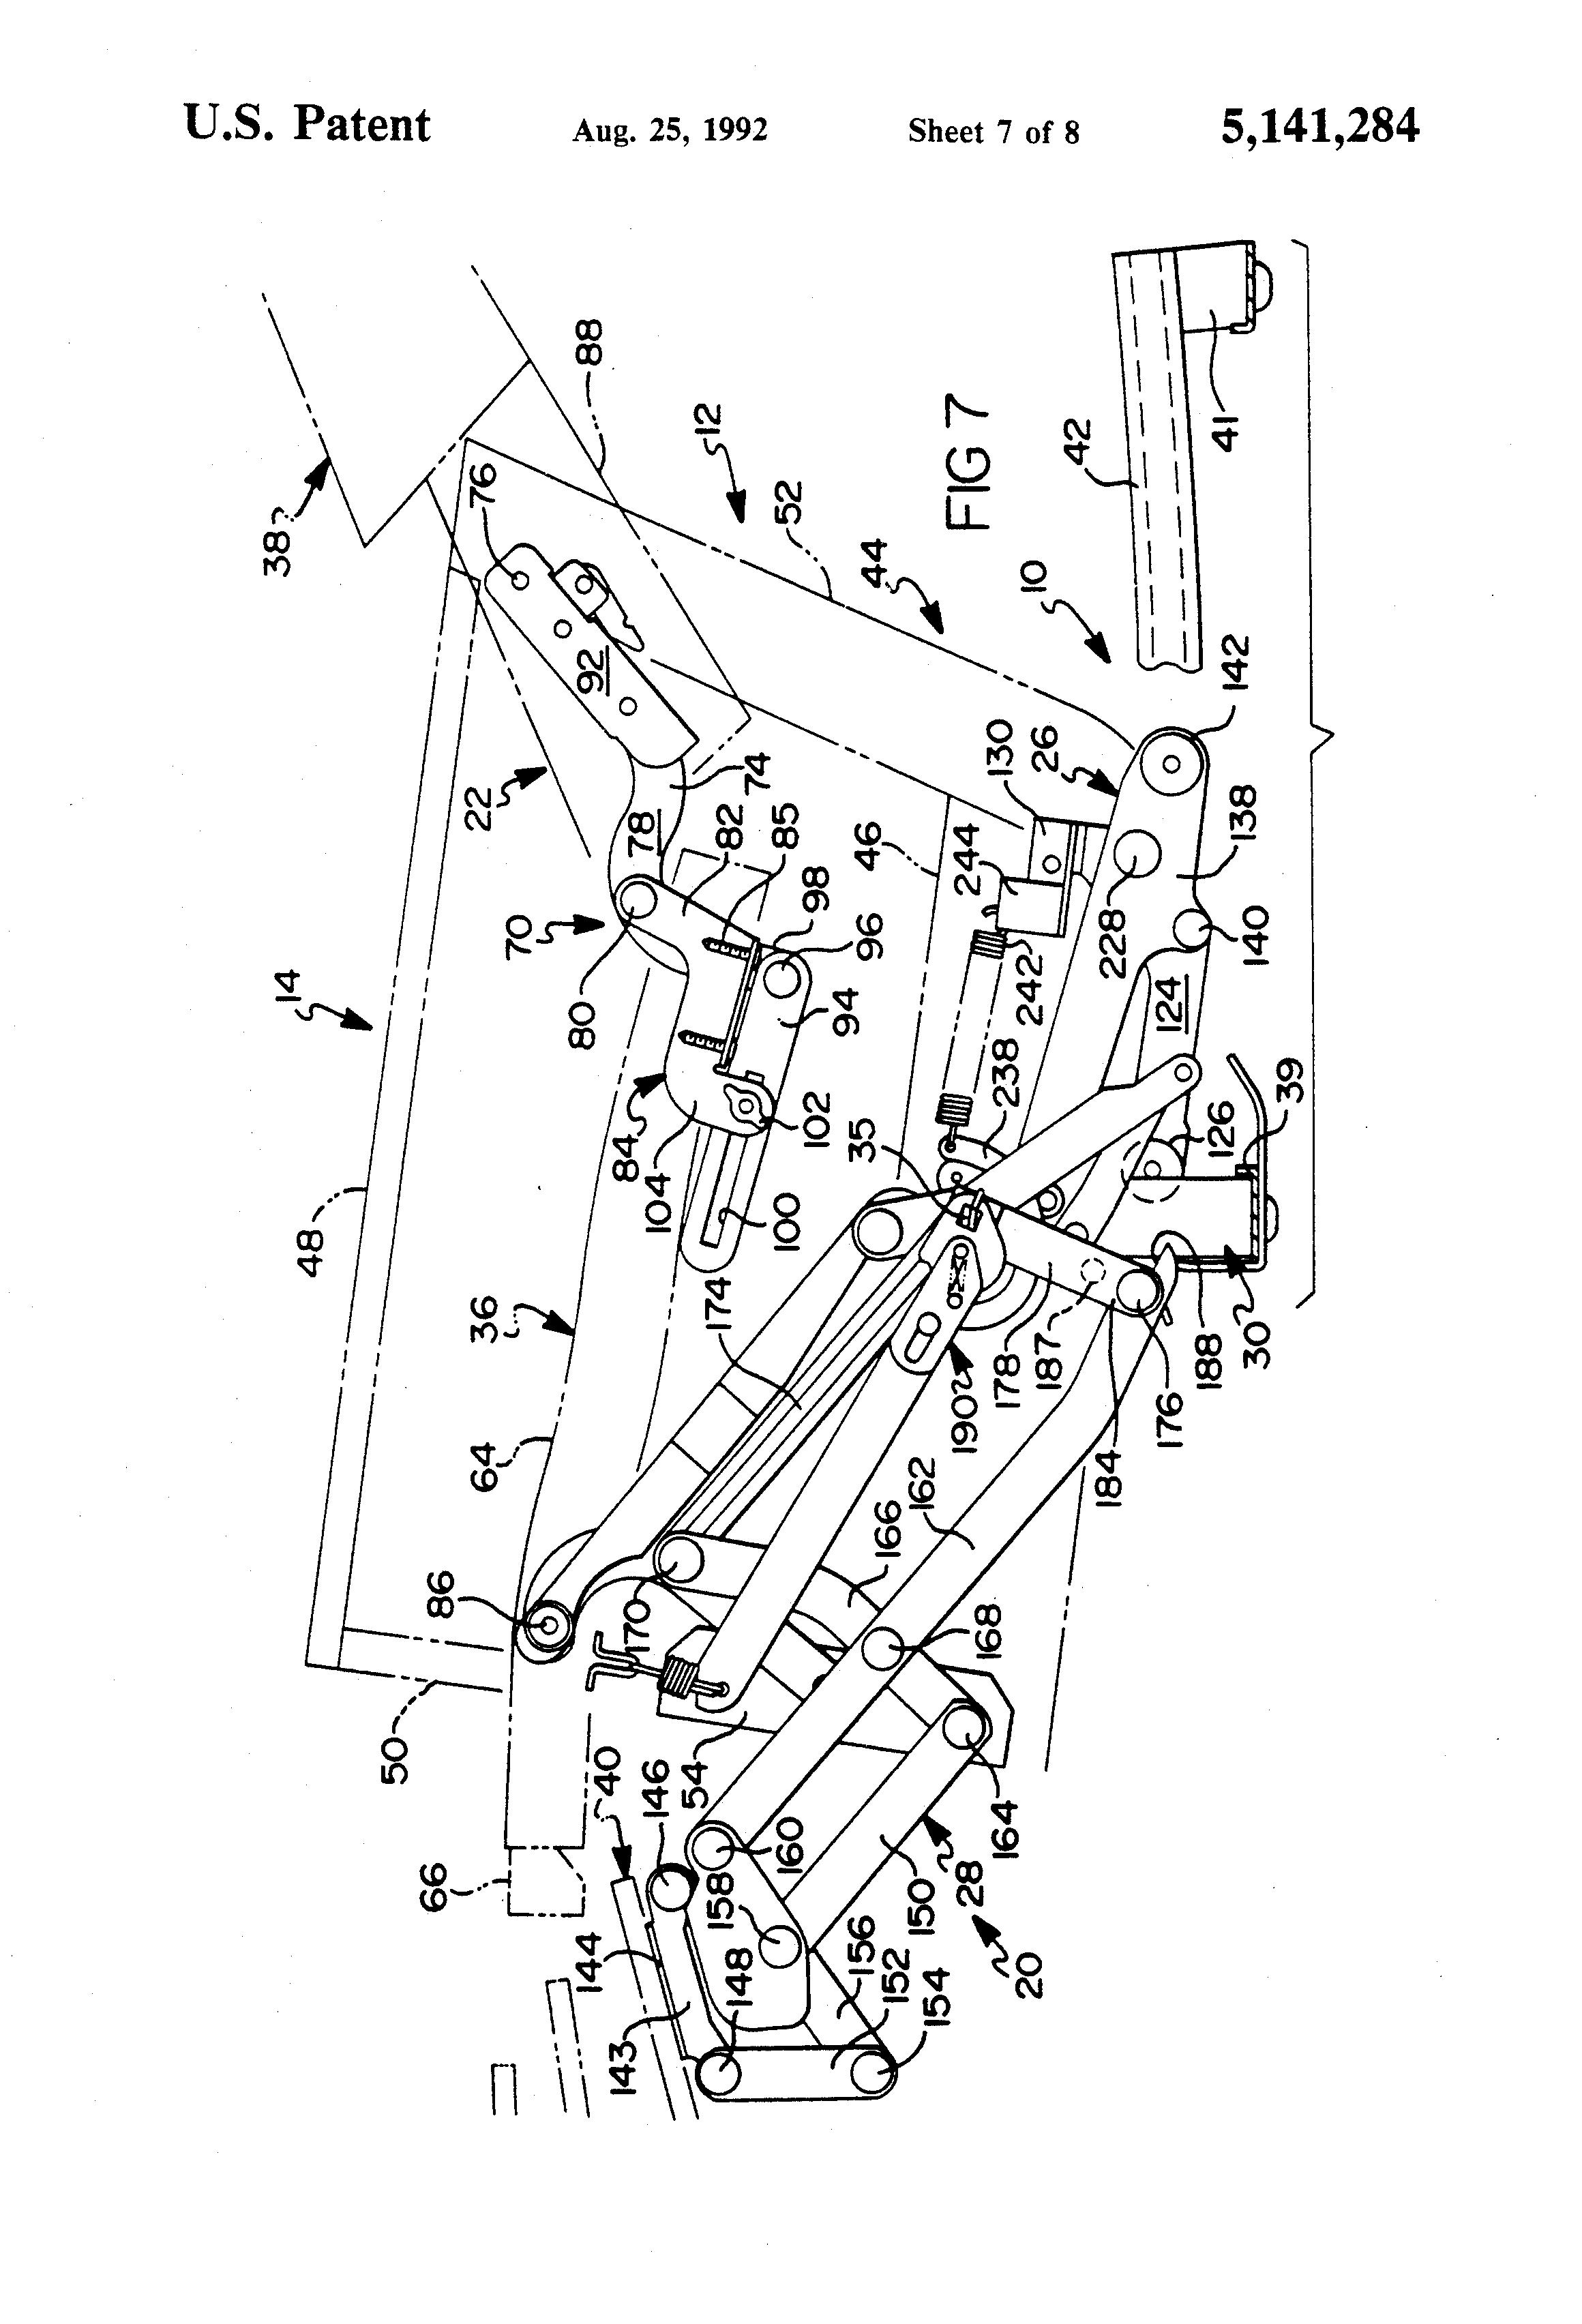 Electric Recliner Wiring Diagram from schematron.org